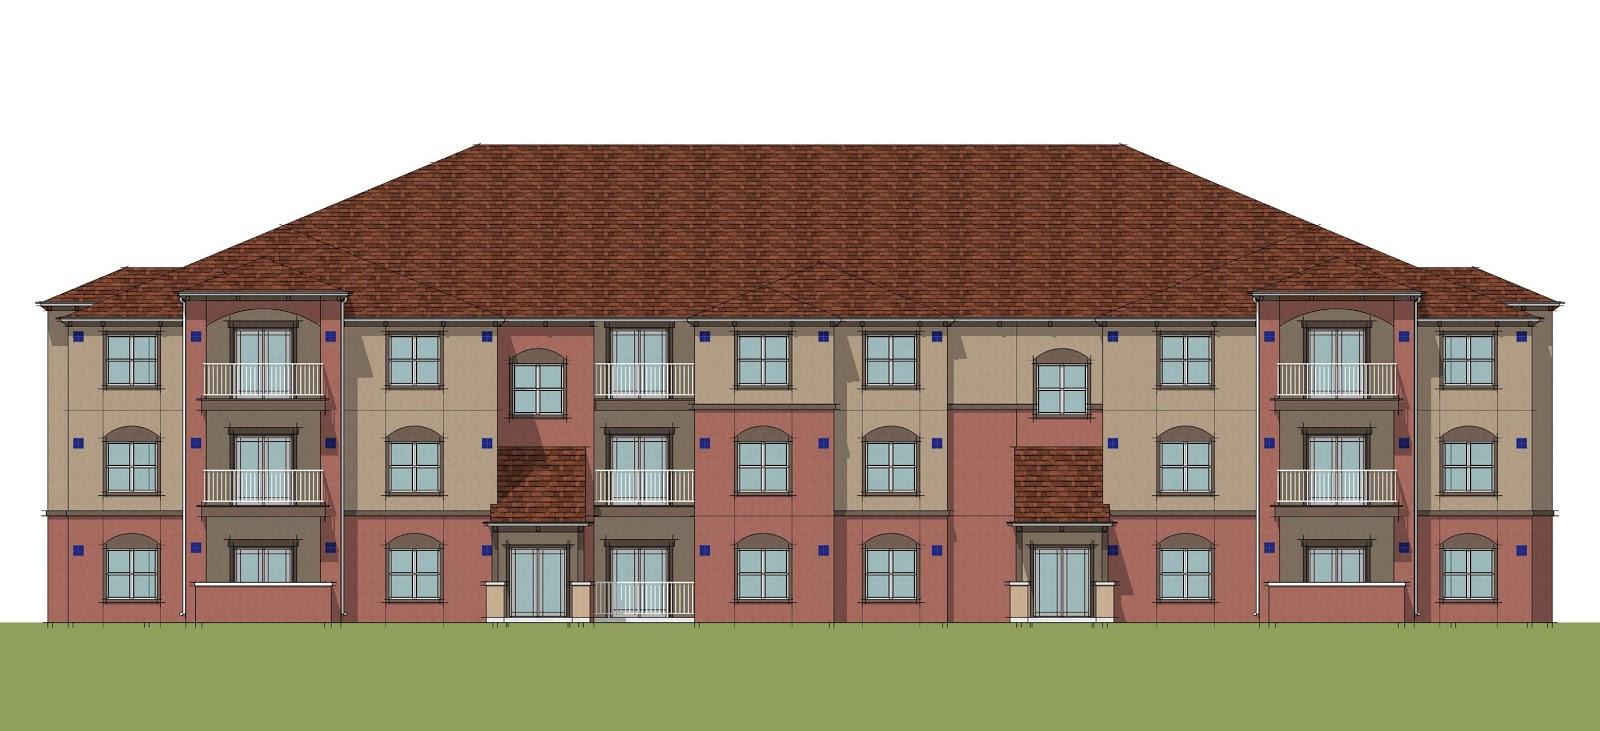 Introducing Verandas Apartments!